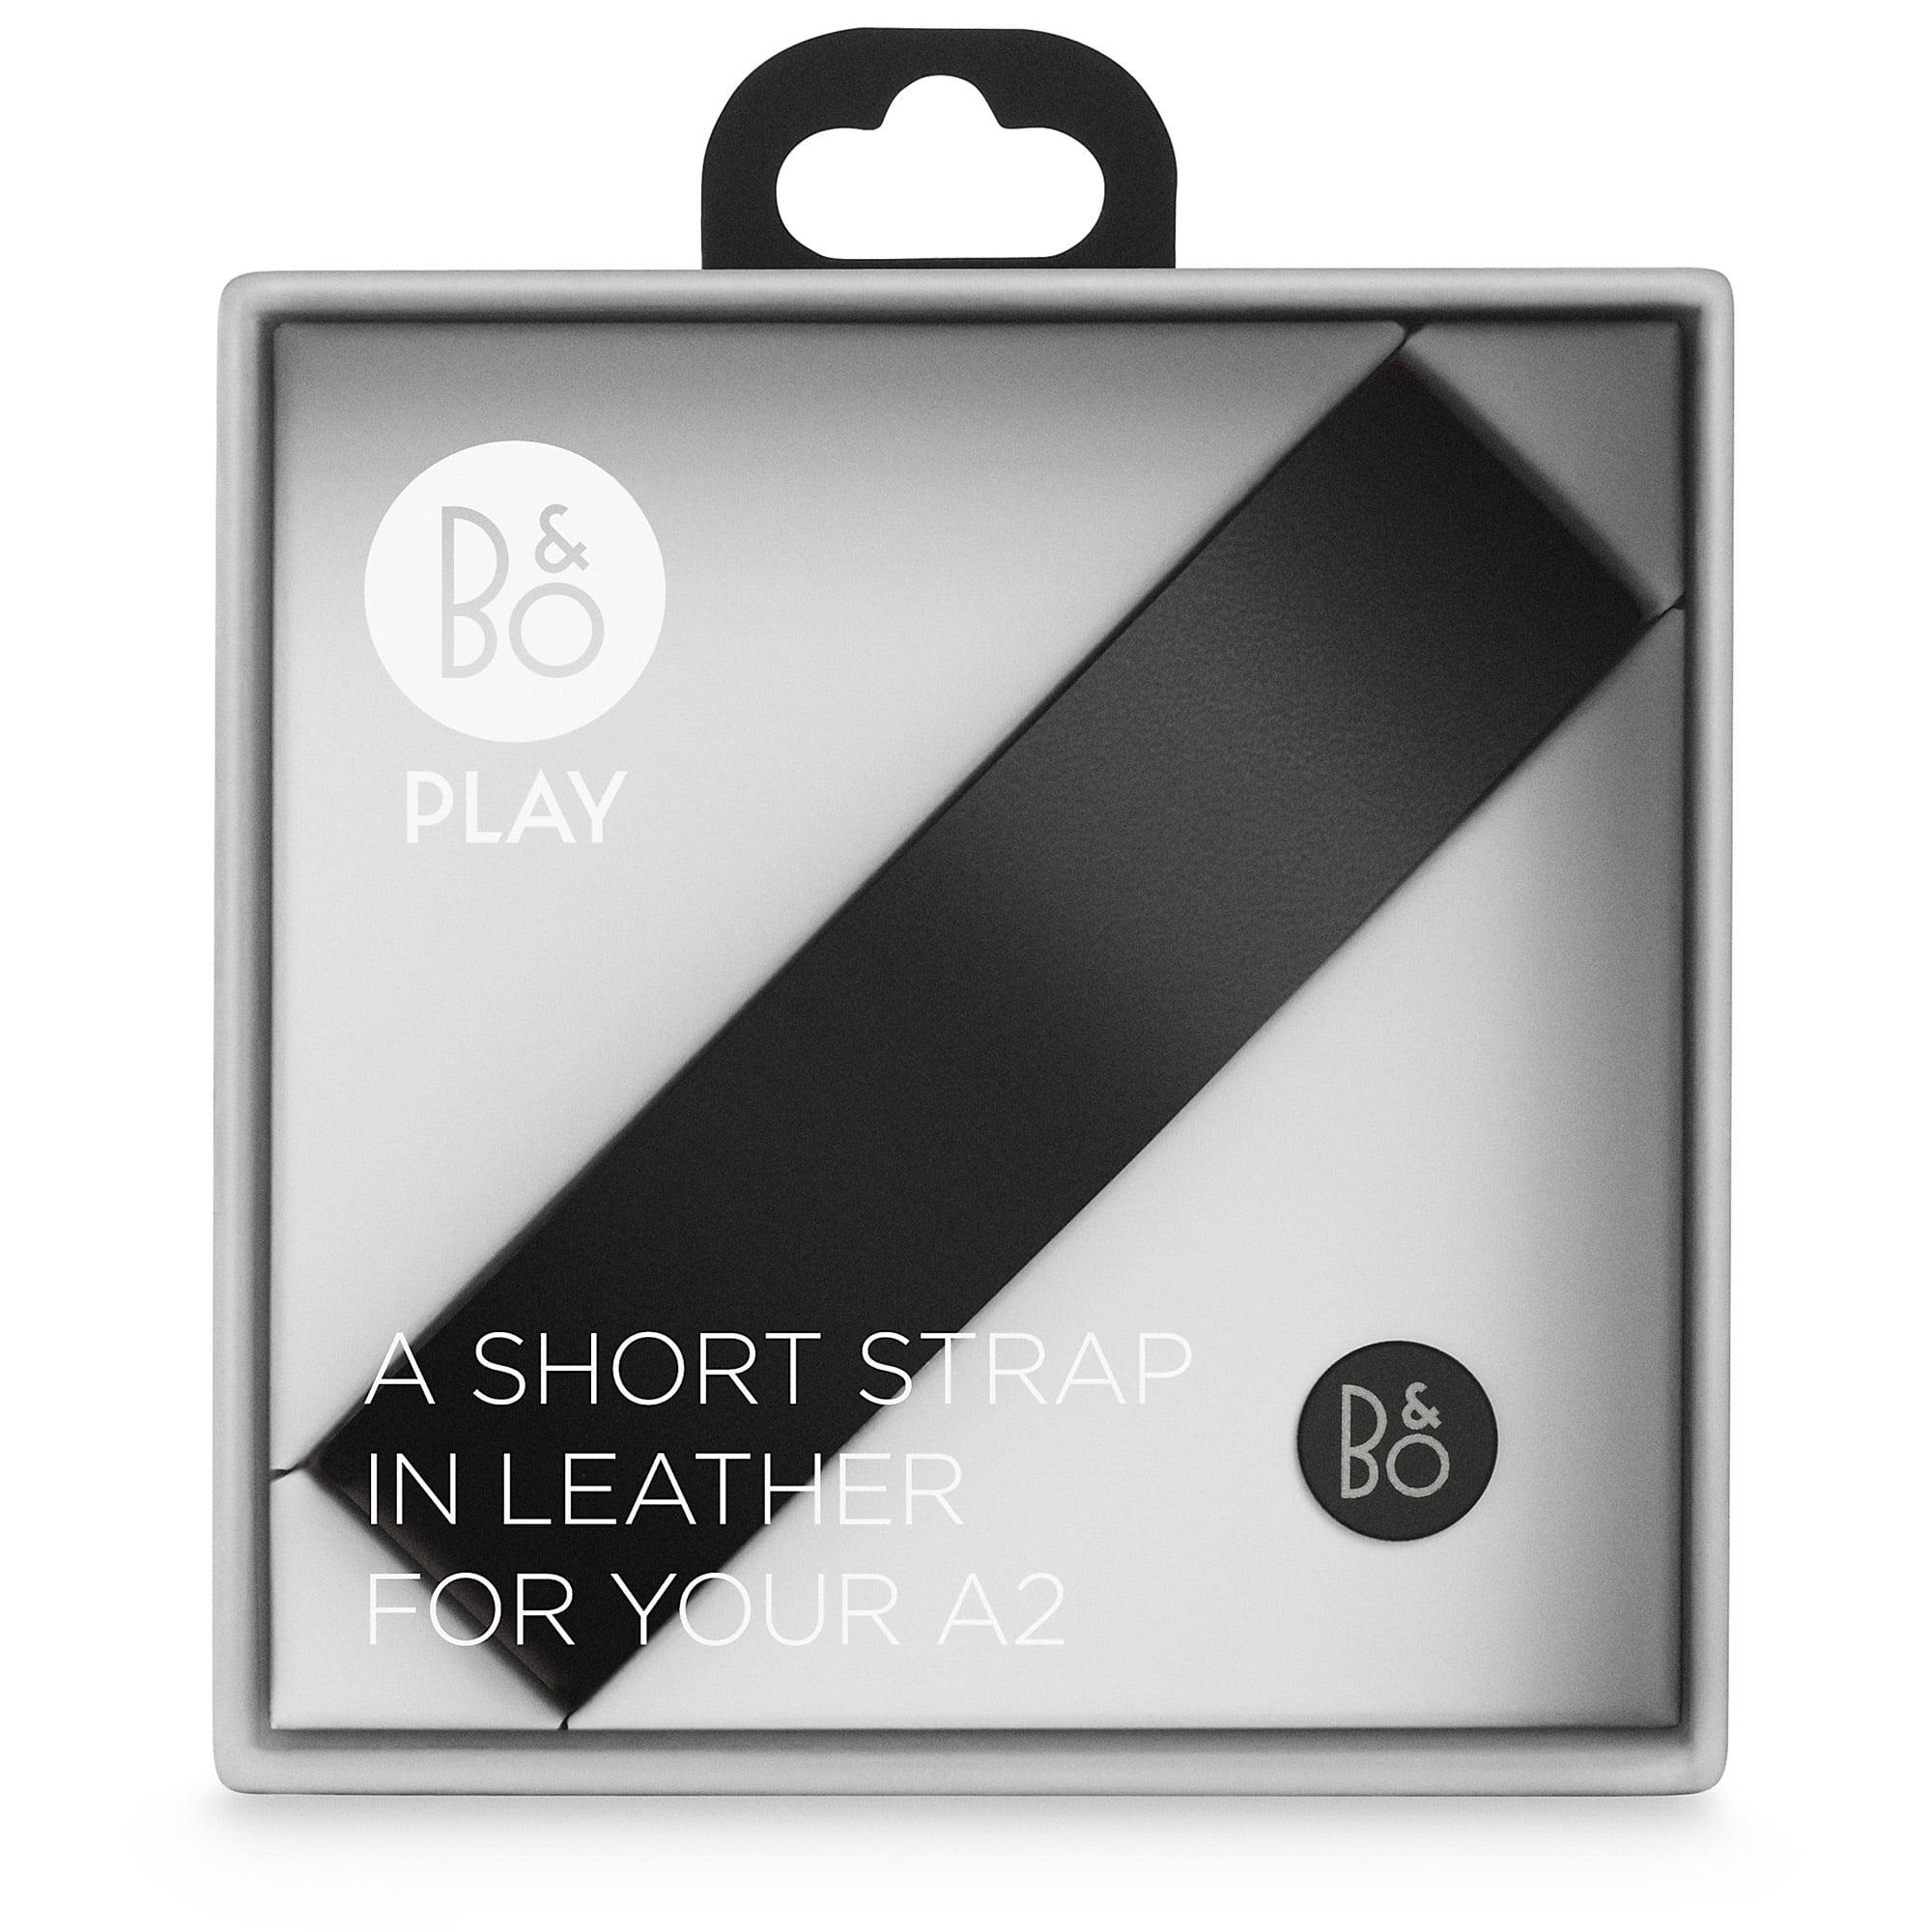 b&o play black short strap 1975970a2